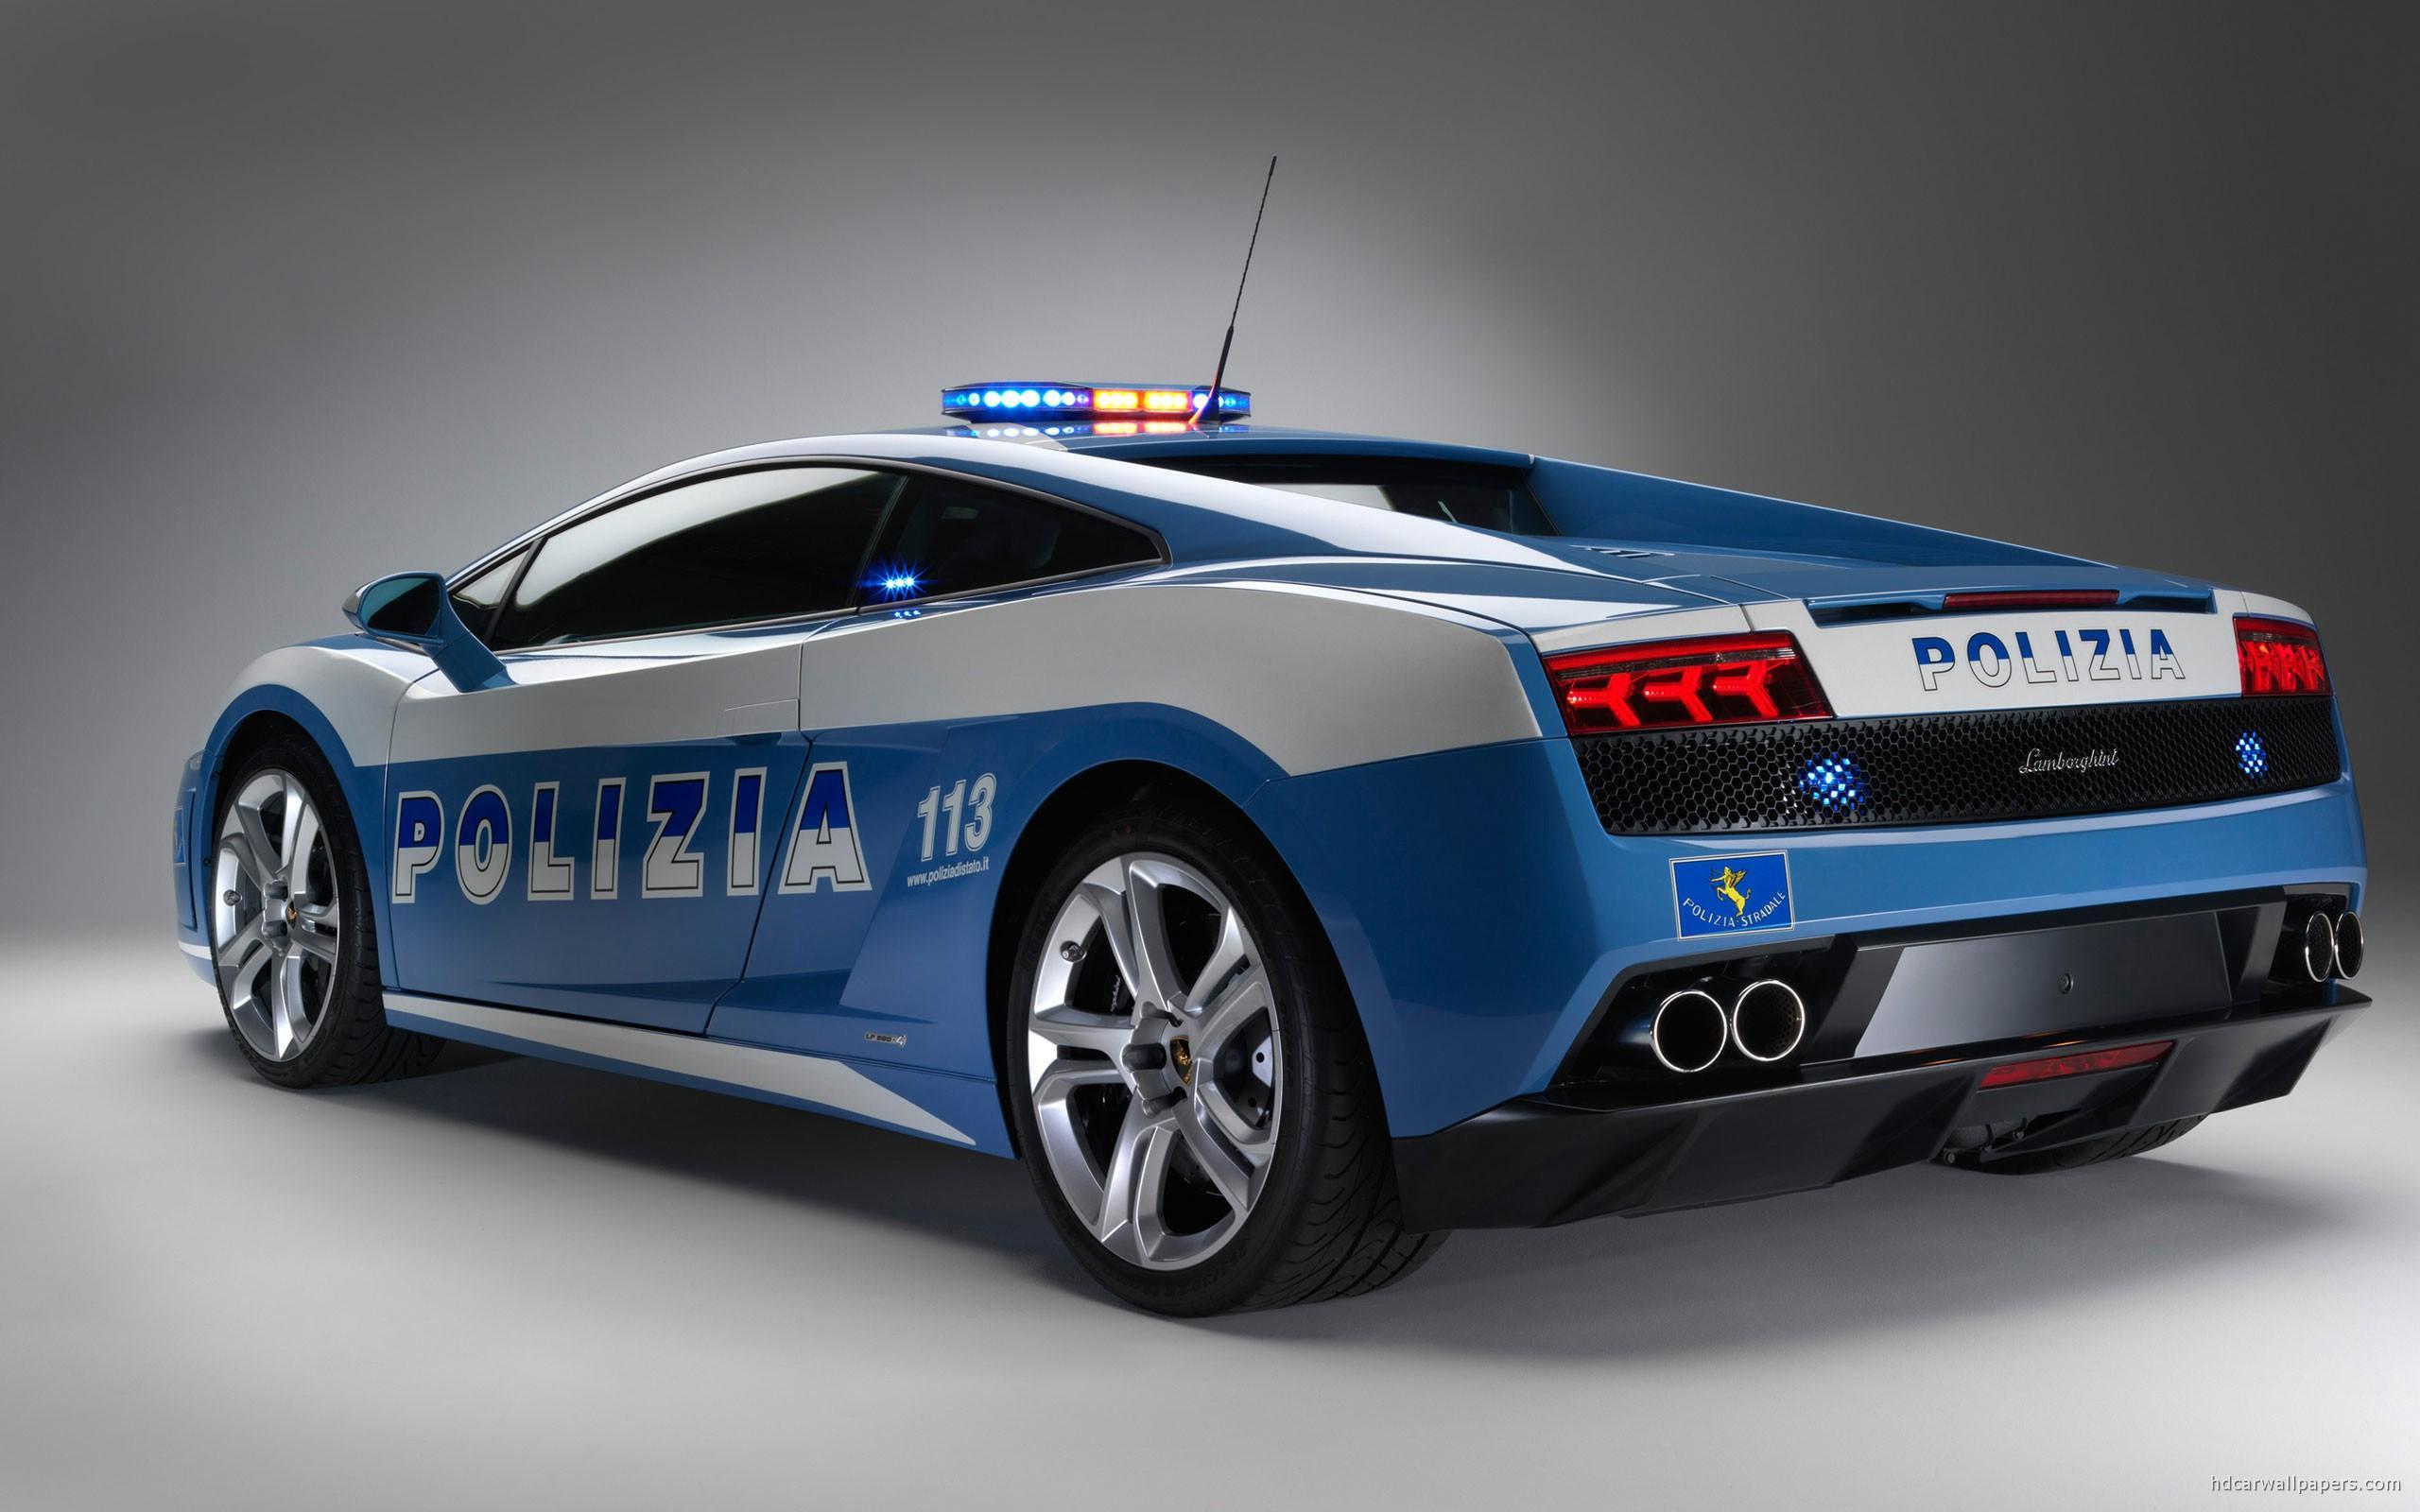 Foto Mobil Polisi Lamborghini Dunia Ottomotif